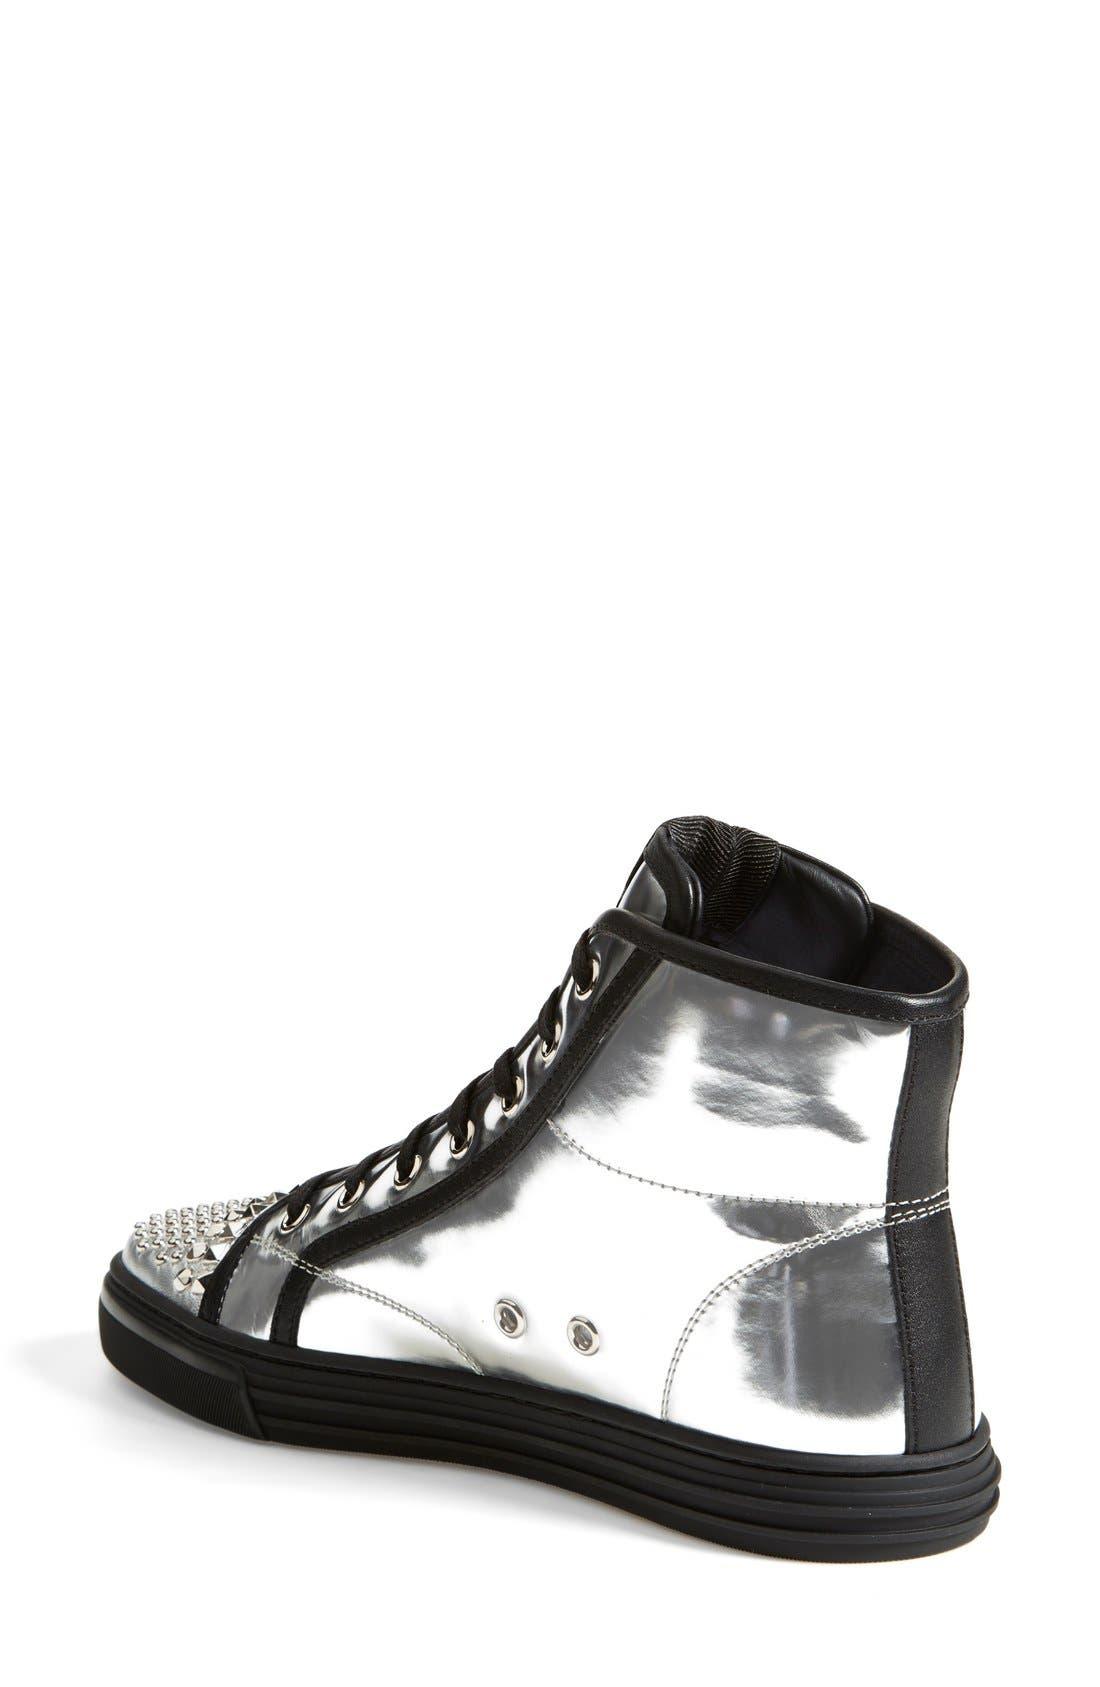 Alternate Image 2  - Gucci 'California' Studded Sneaker (Women)